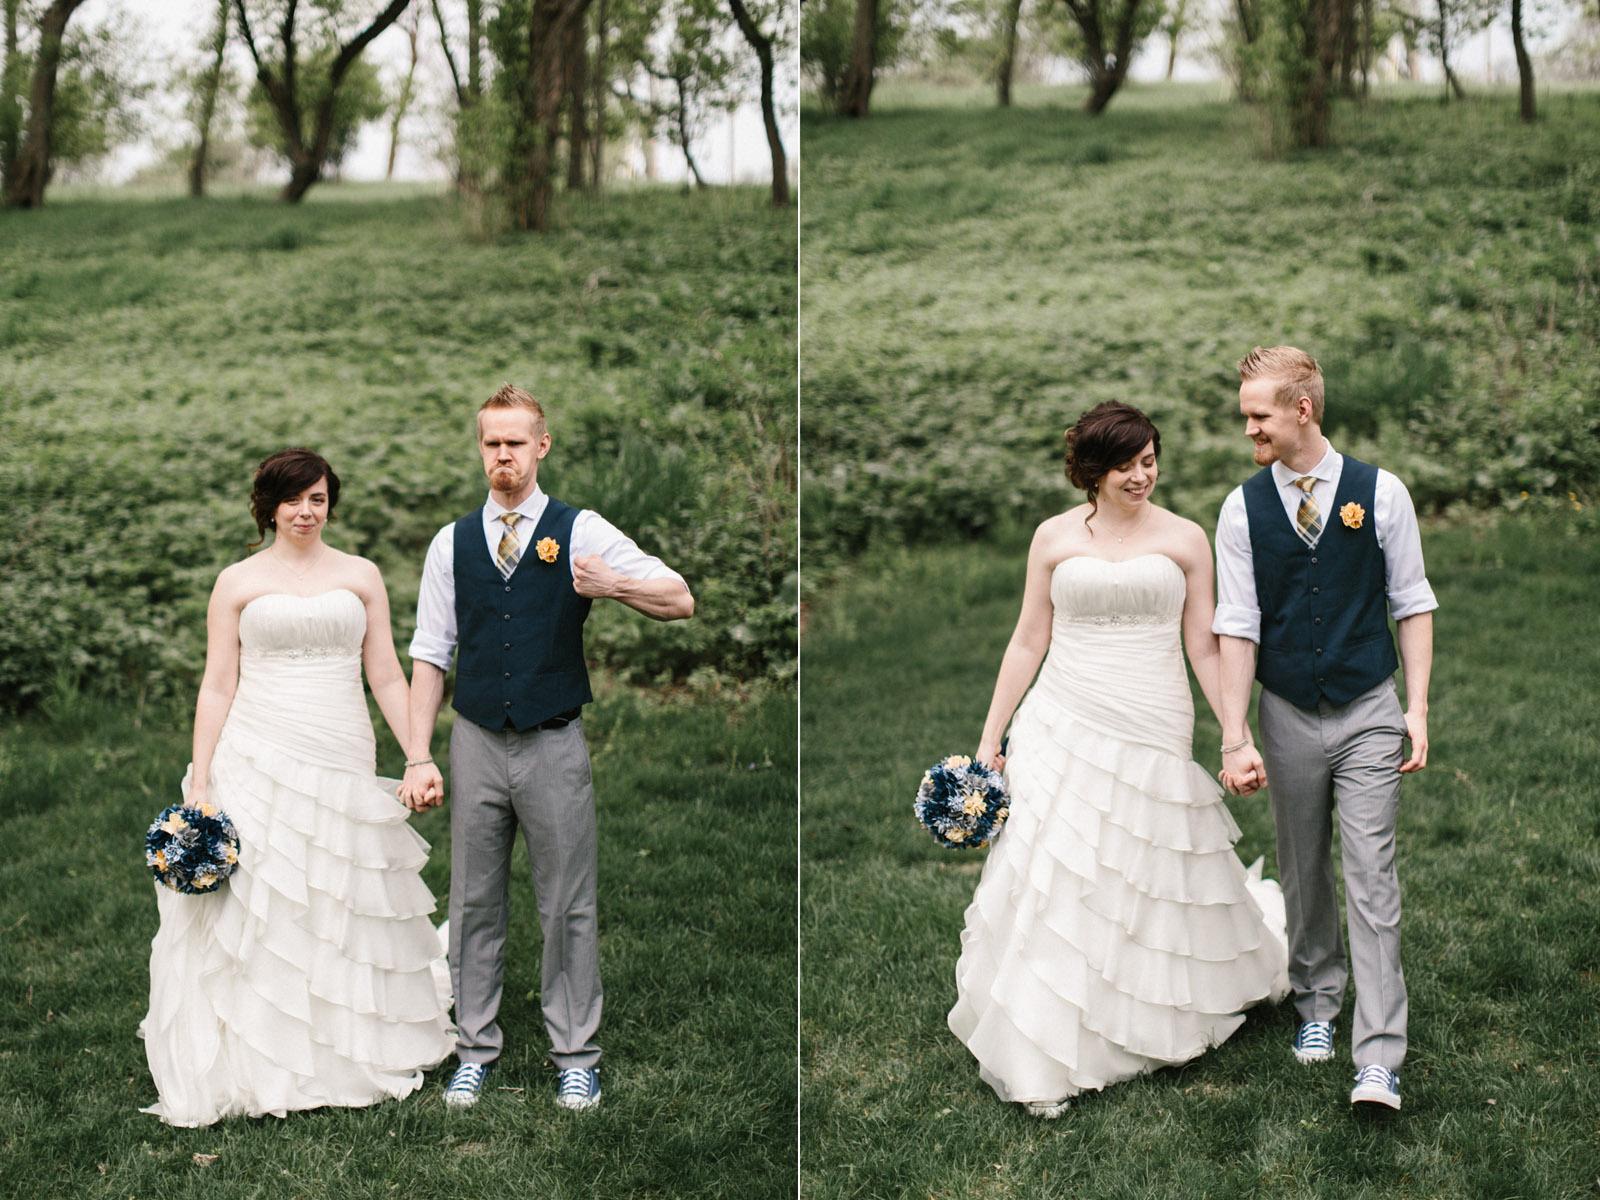 DesMoines_Wedding_Photographer_Spencer&Amanda_027.jpg